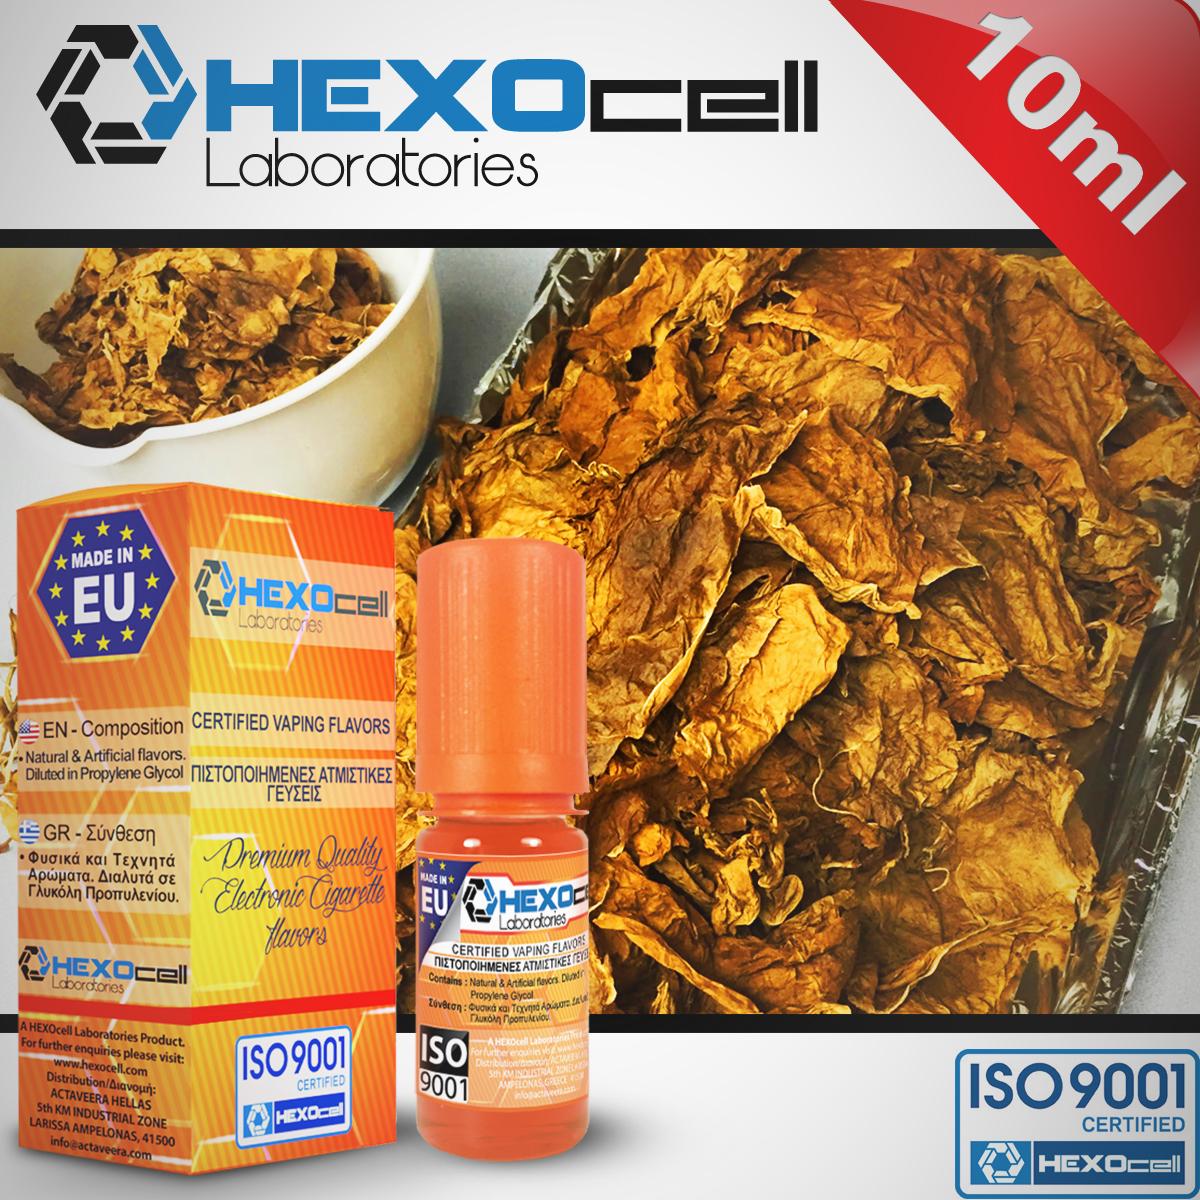 Diy 10ml aged tobacco eliquid flavor by hexocell diy 10ml aged tobacco eliquid flavor by hexocell image 1 solutioingenieria Gallery